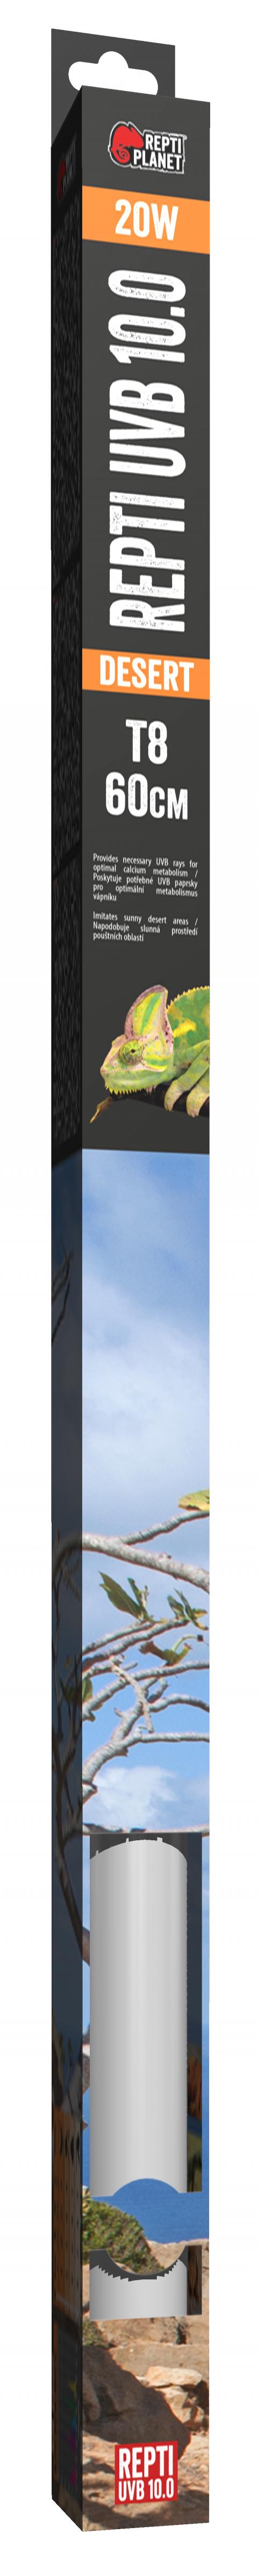 Spuldze terārija lampai - ReptiPlanet Repti T8 UVB 10.0 20W, 60 cm title=